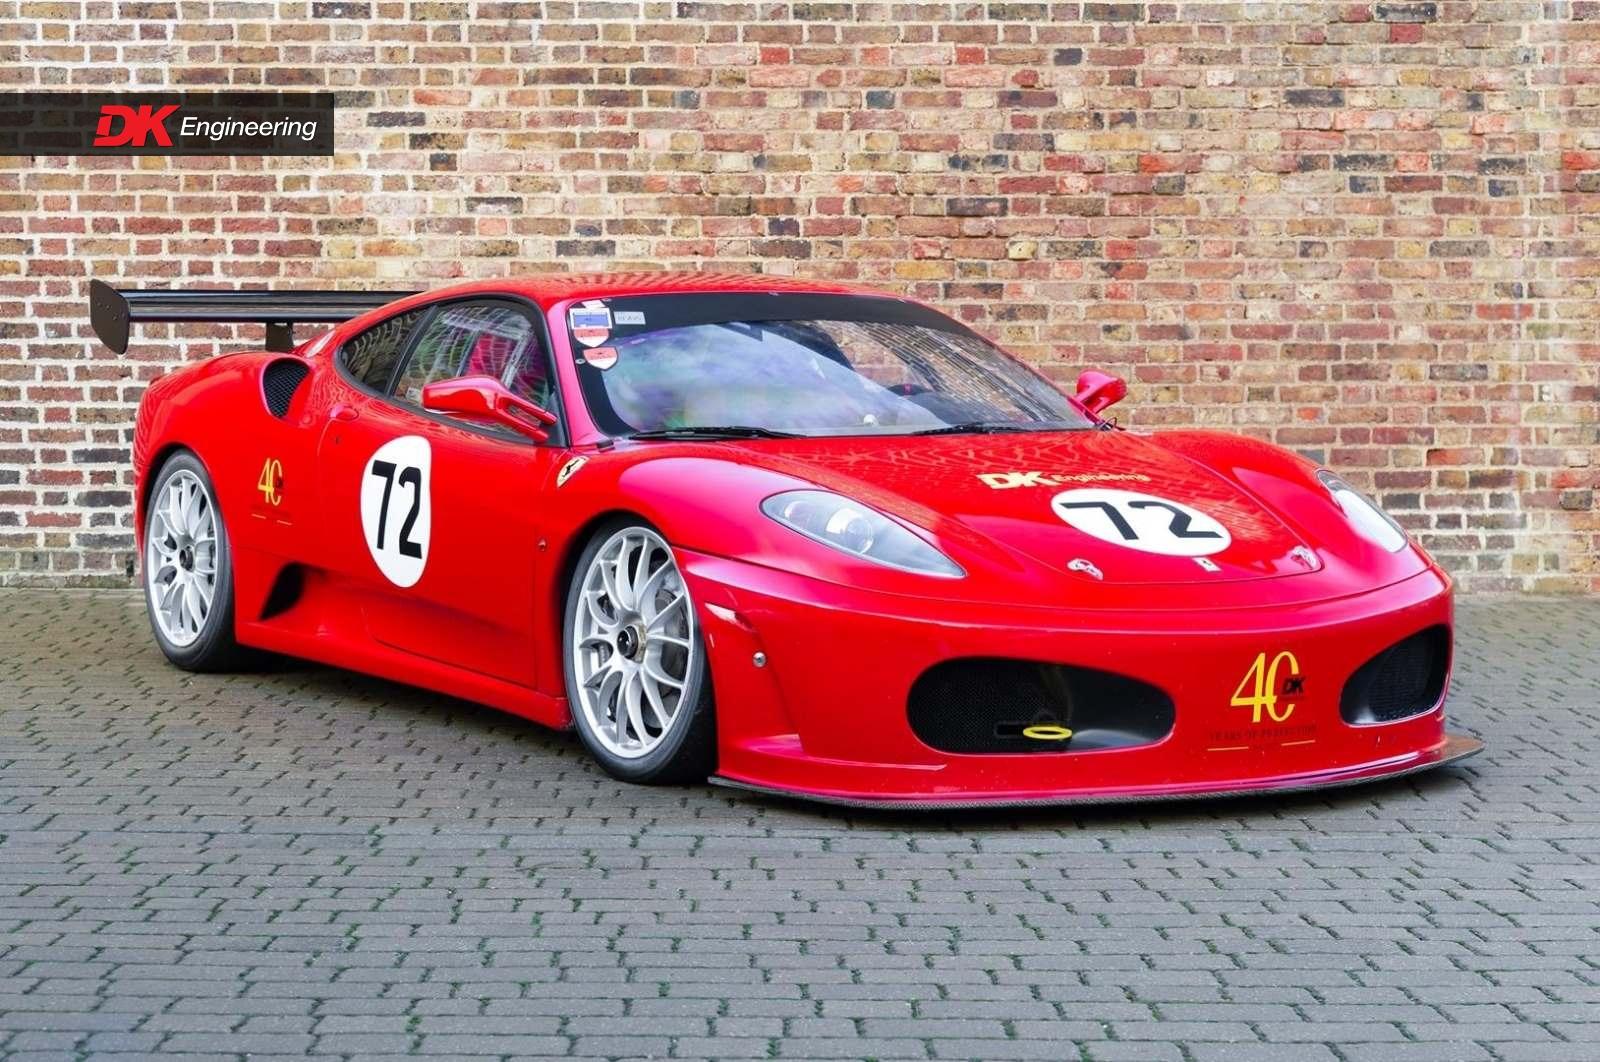 Wish Galactictechtips Xyz الصور والأفكار حول Ferrari F430 Challenge For Sale Canada